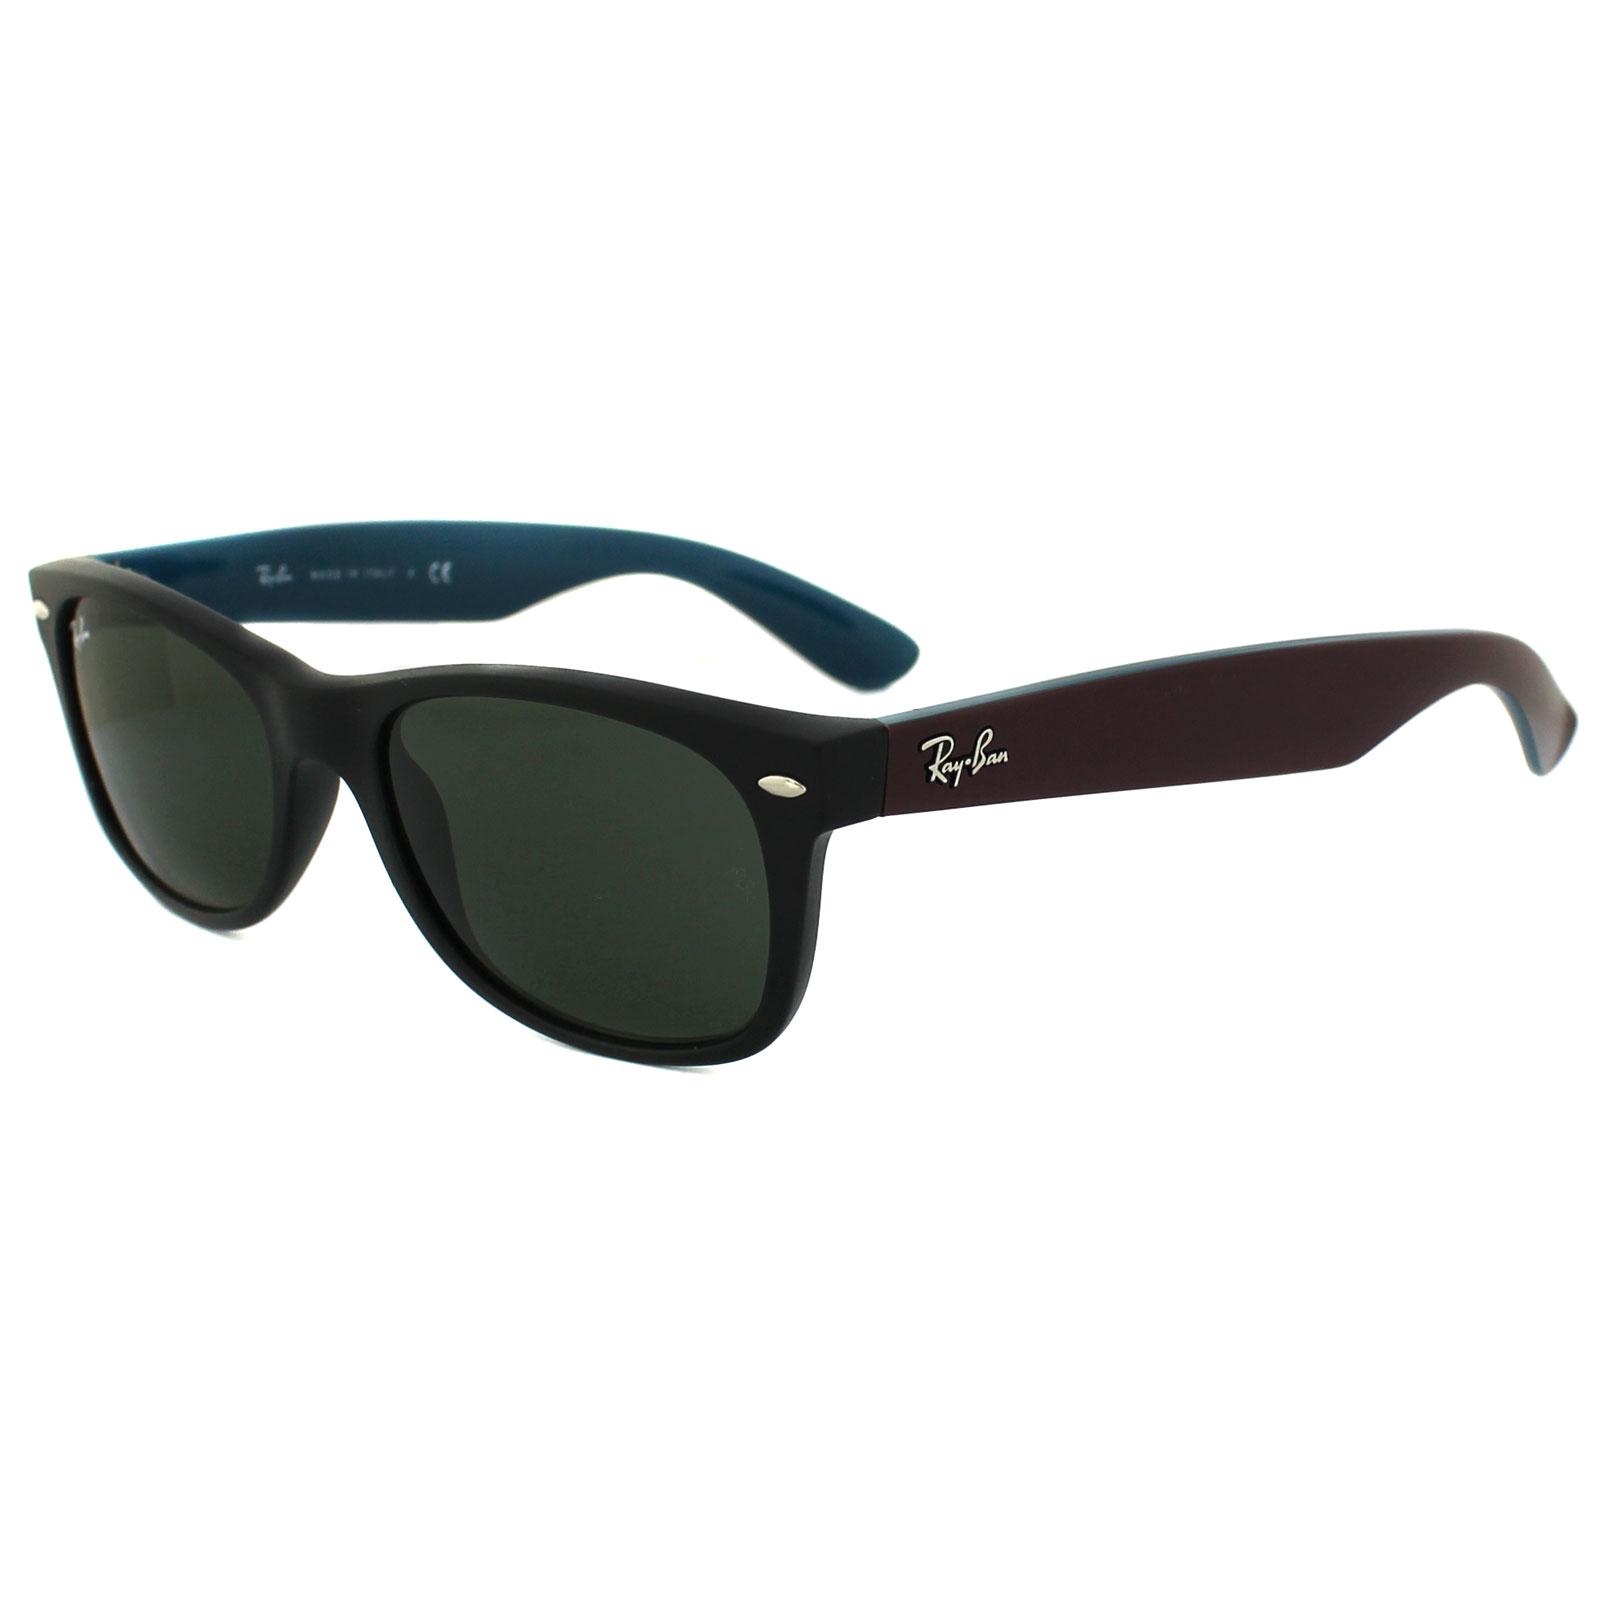 a6cad45e6c6 Ray-Ban Sunglasses New Wayfarer 2132 6182 Matt Black Purple   Blue Green  Small Thumbnail ...